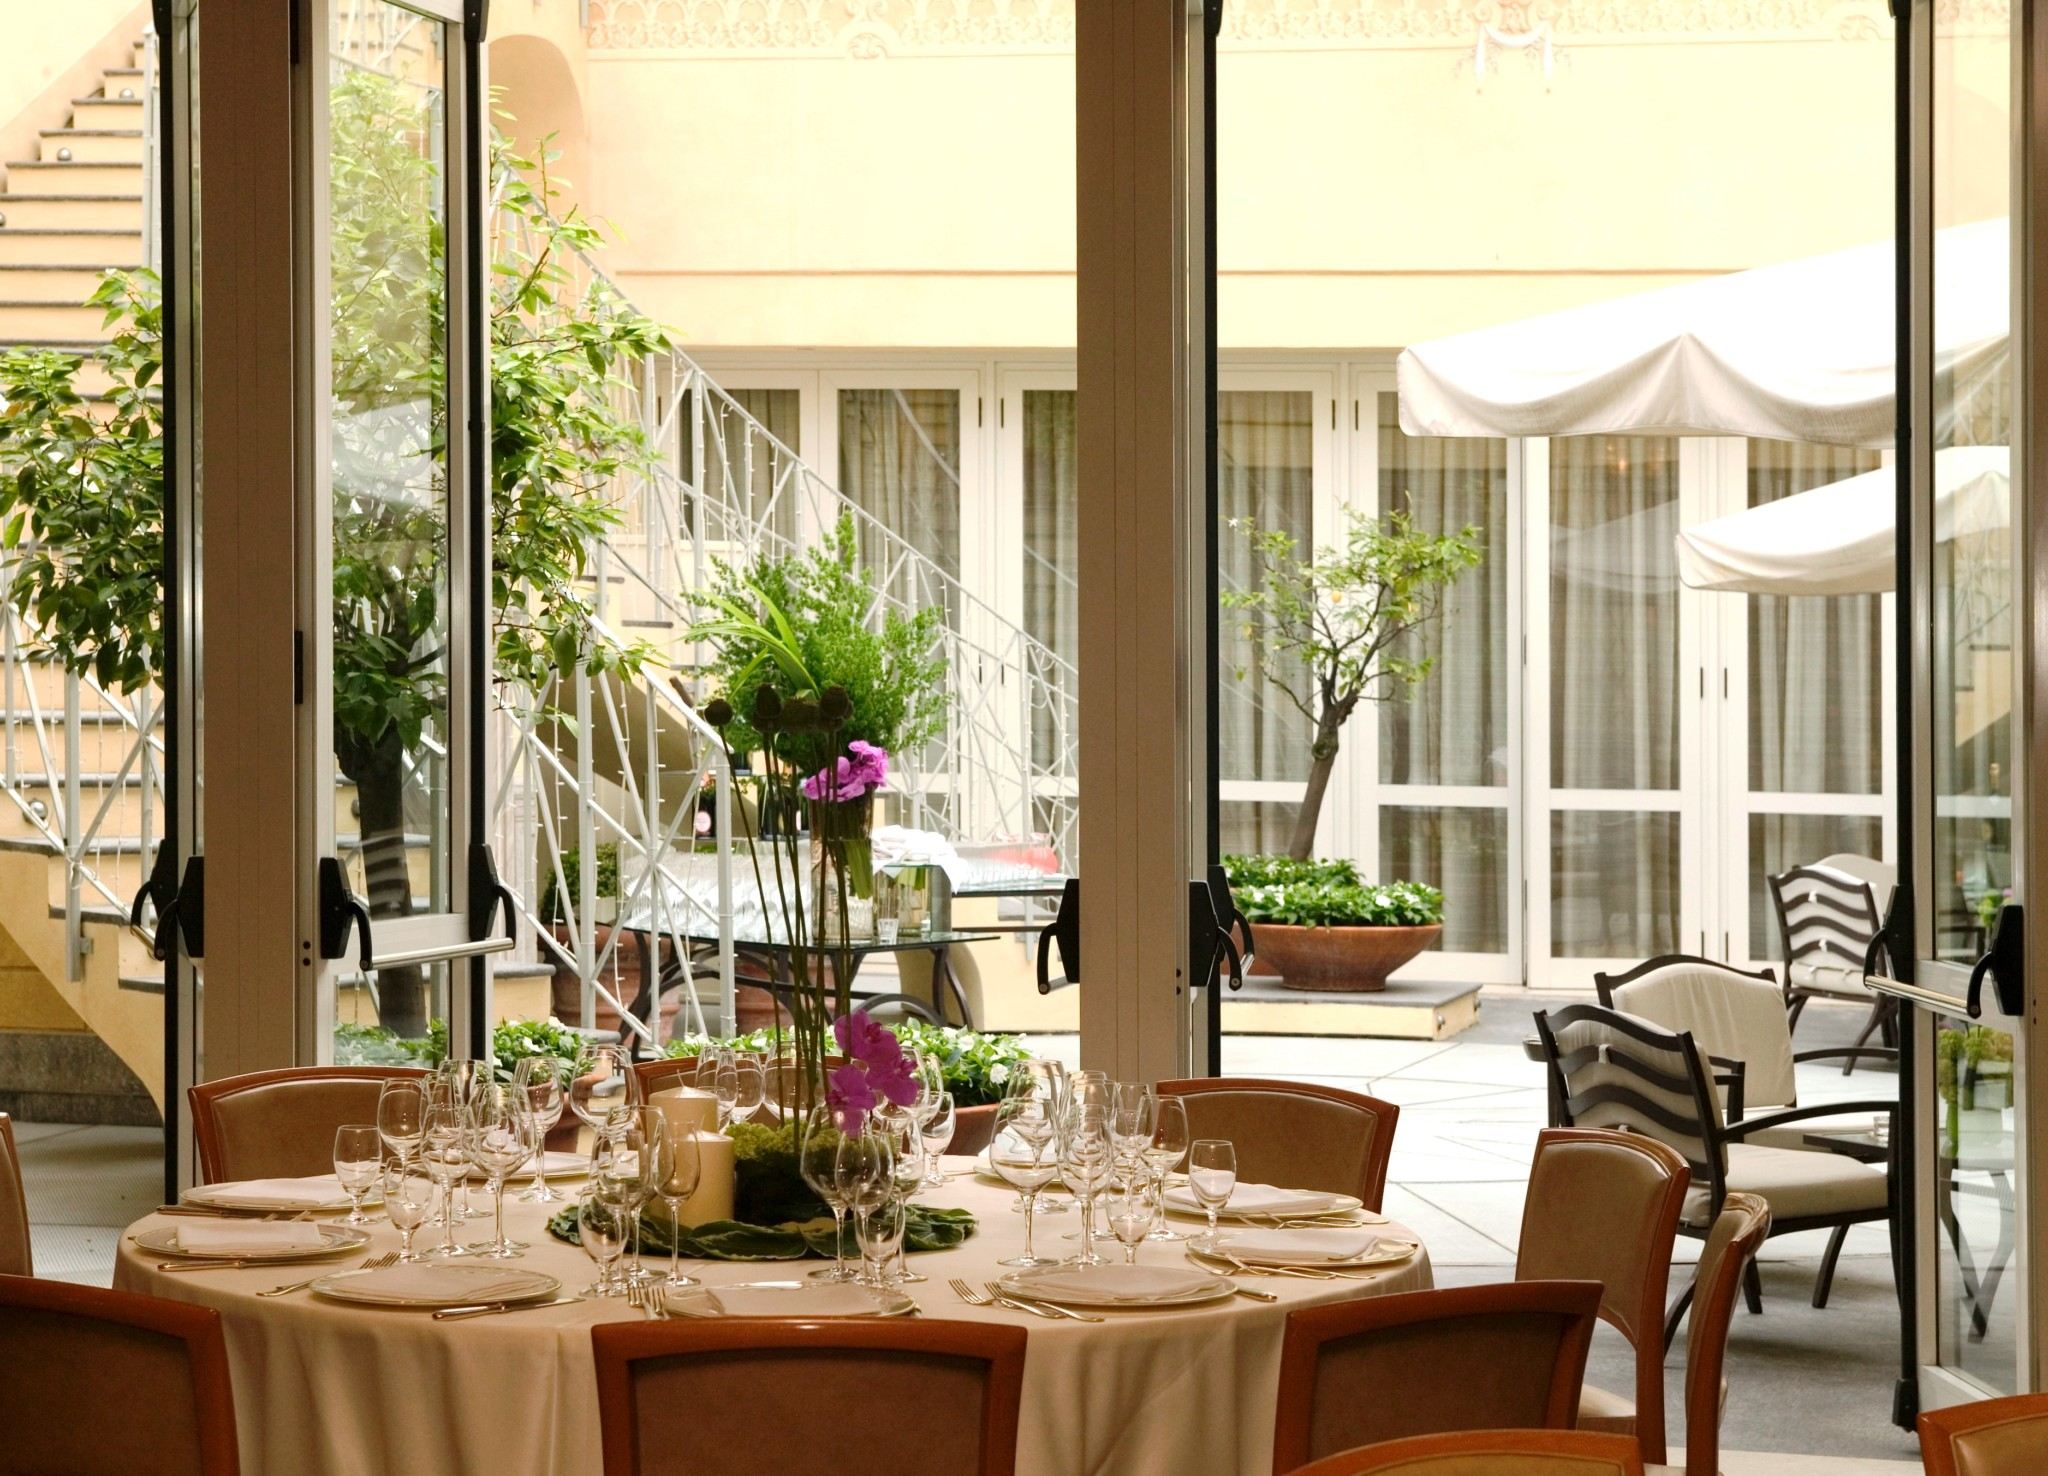 Albergo Sapori Al Four Seasons Hotel Milano Lesclusiva Cena Stradivari Sapori